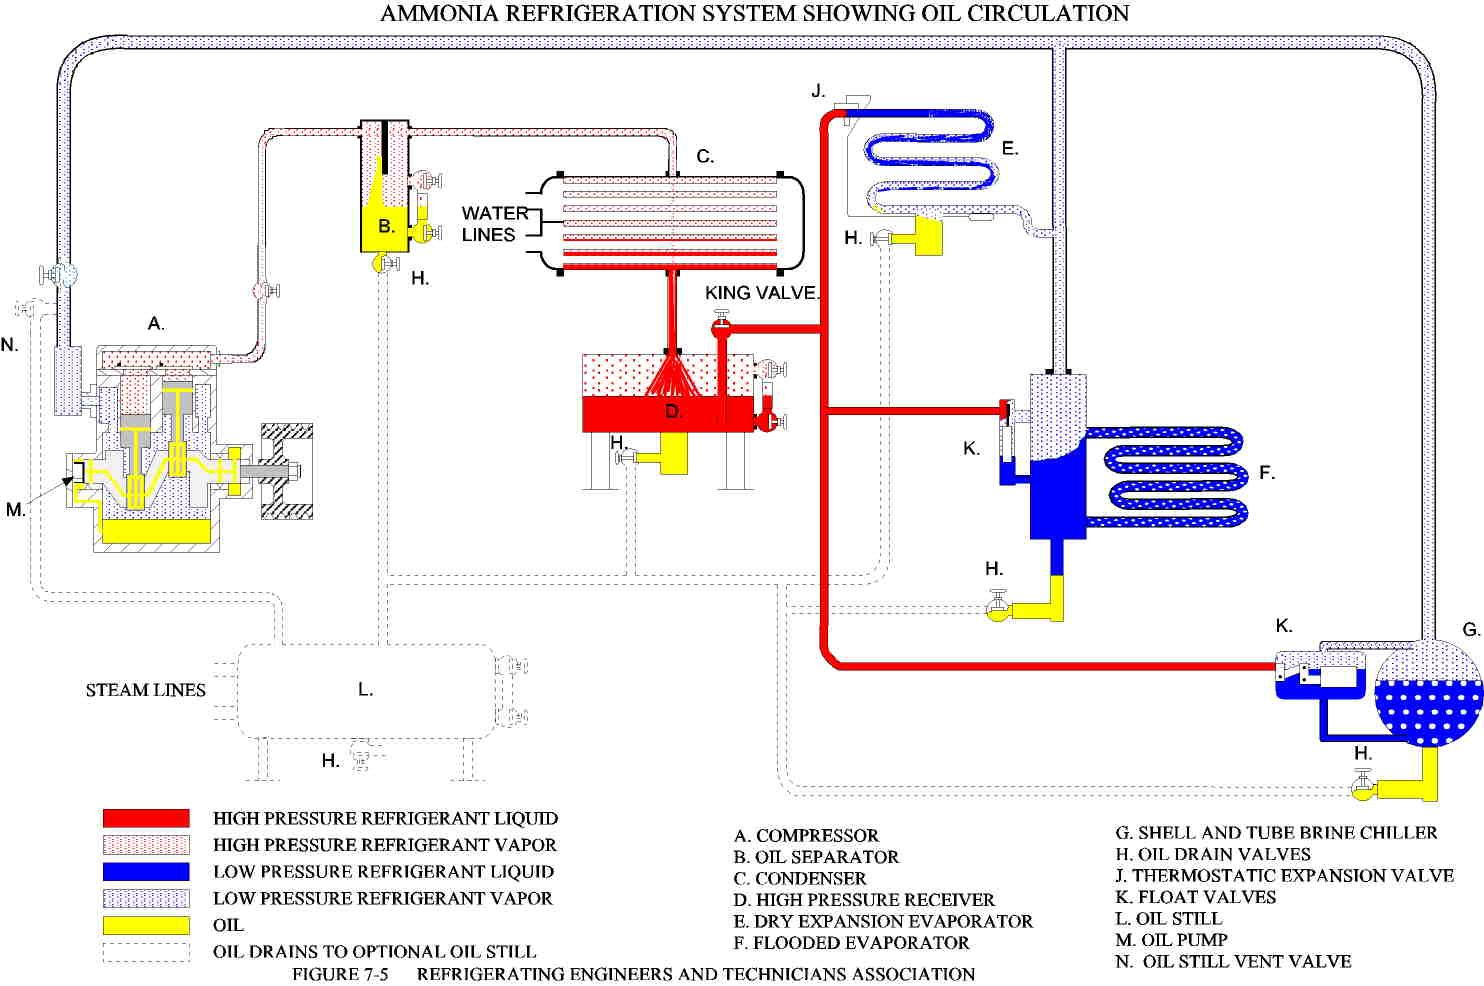 ammonia refrigeration system google search [ 1484 x 986 Pixel ]